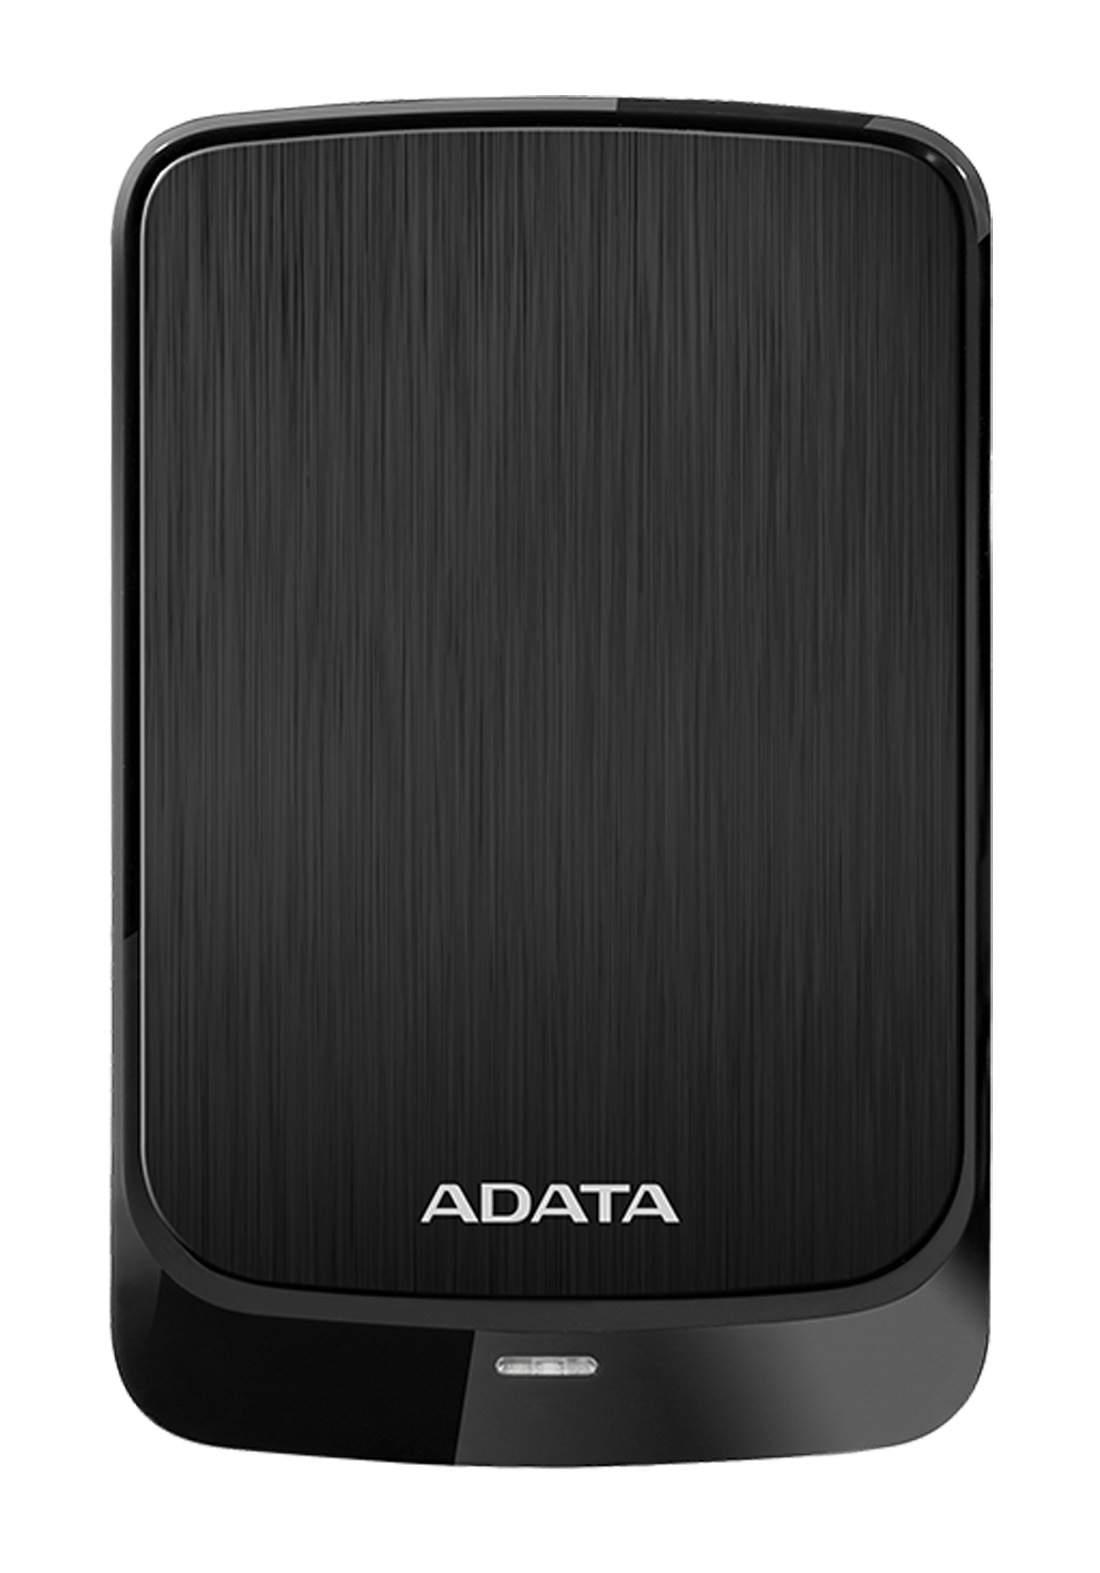 ADATA HD320 External Hard Drive 1TB - Black هارد خارجي